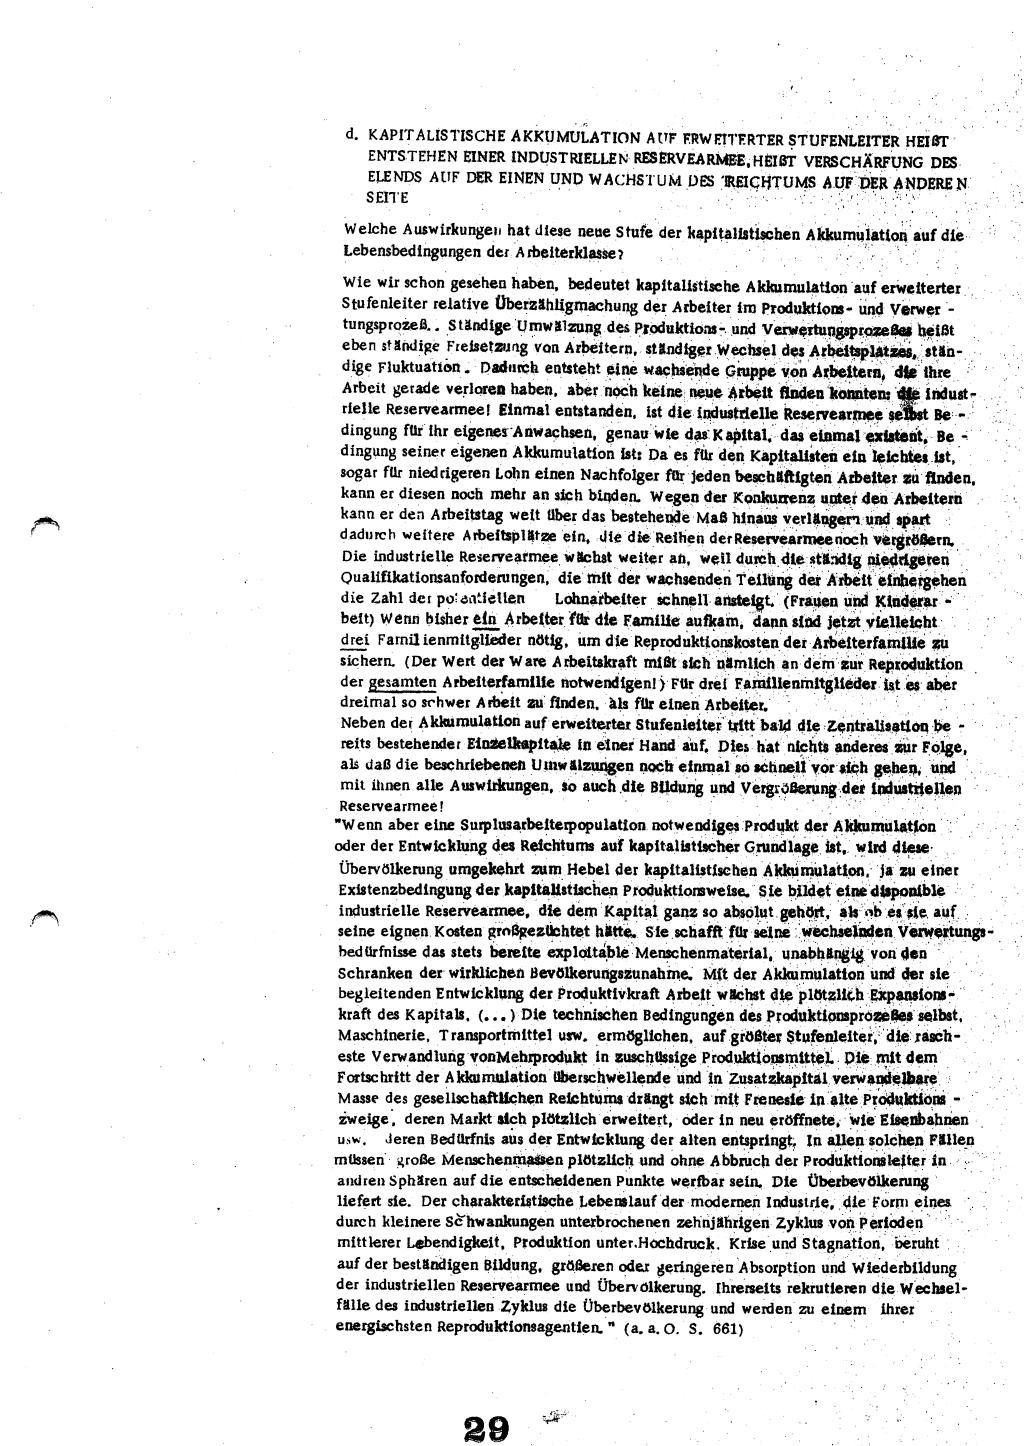 KSV_Grundschulung_1975_01_48